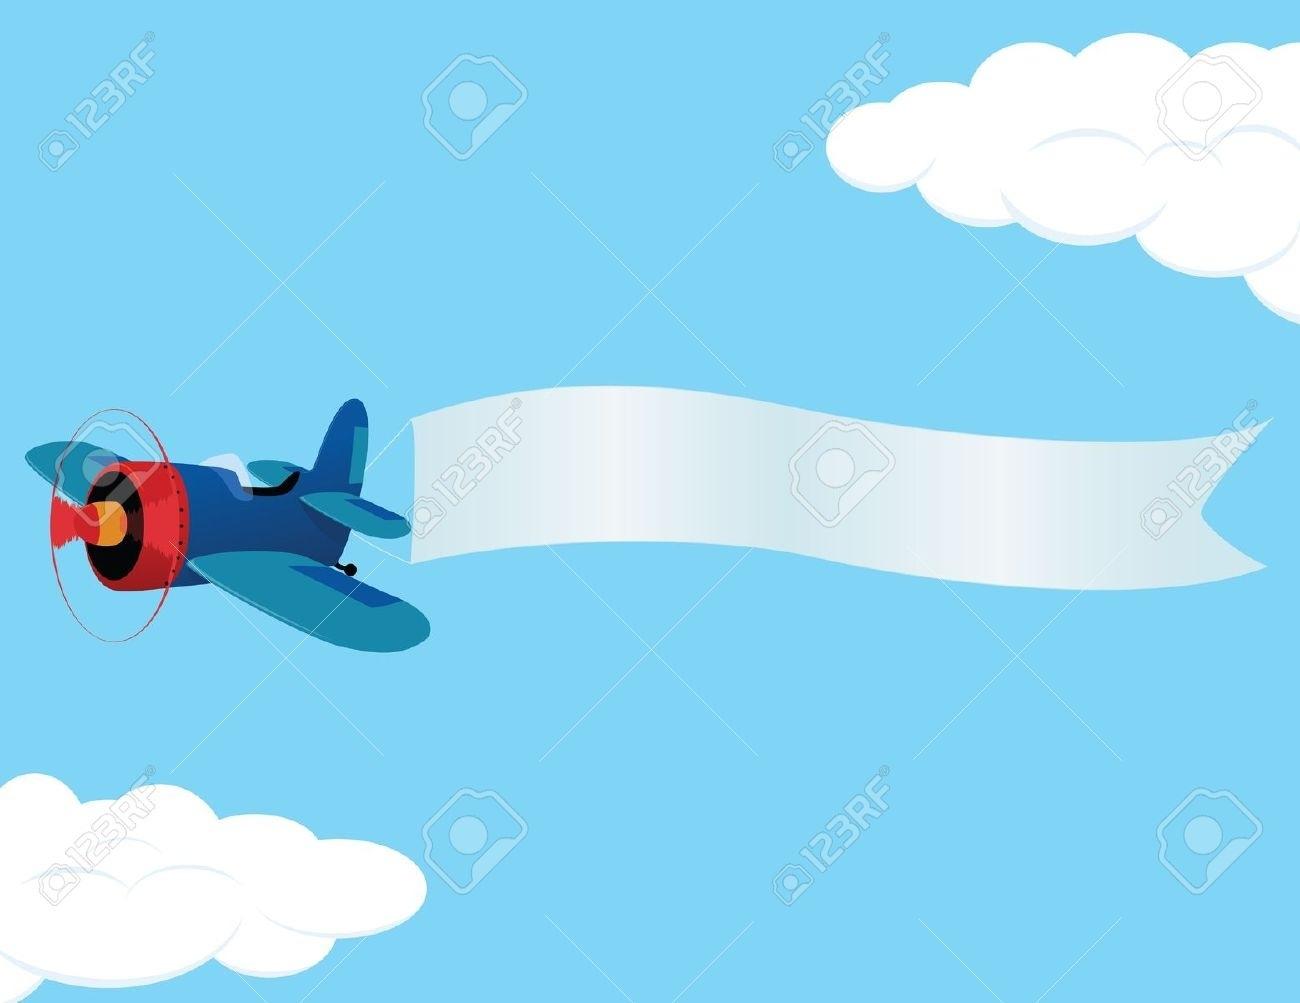 Airplane clipart banner clipart George des Clipartsco Curious Art